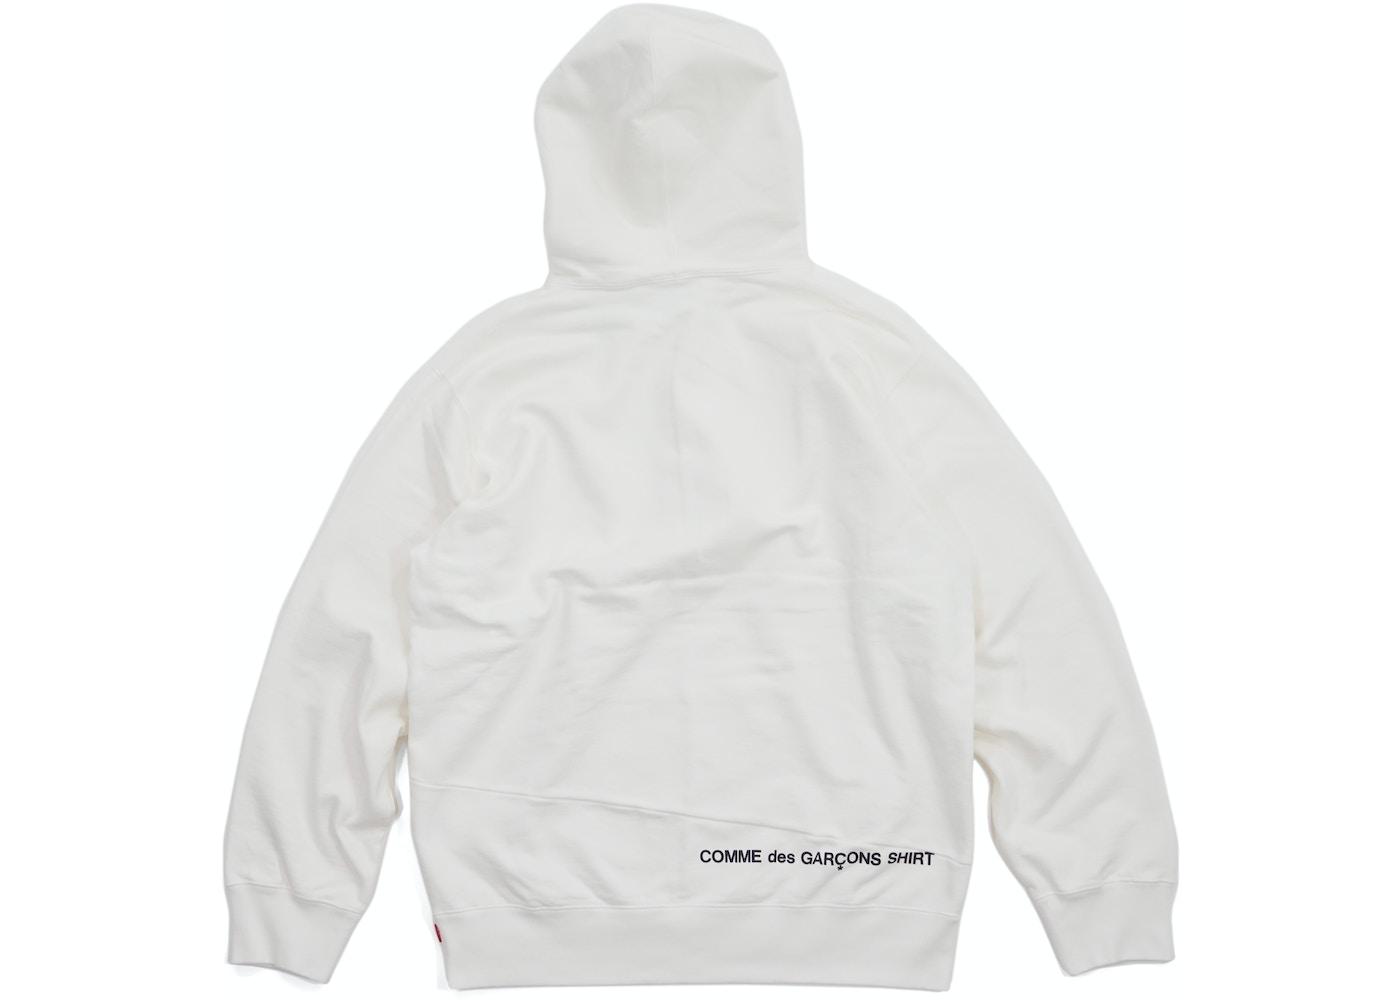 3010832d7682 Supreme Comme des Garcons SHIRT Split Box Logo Hooded Sweatshirt White